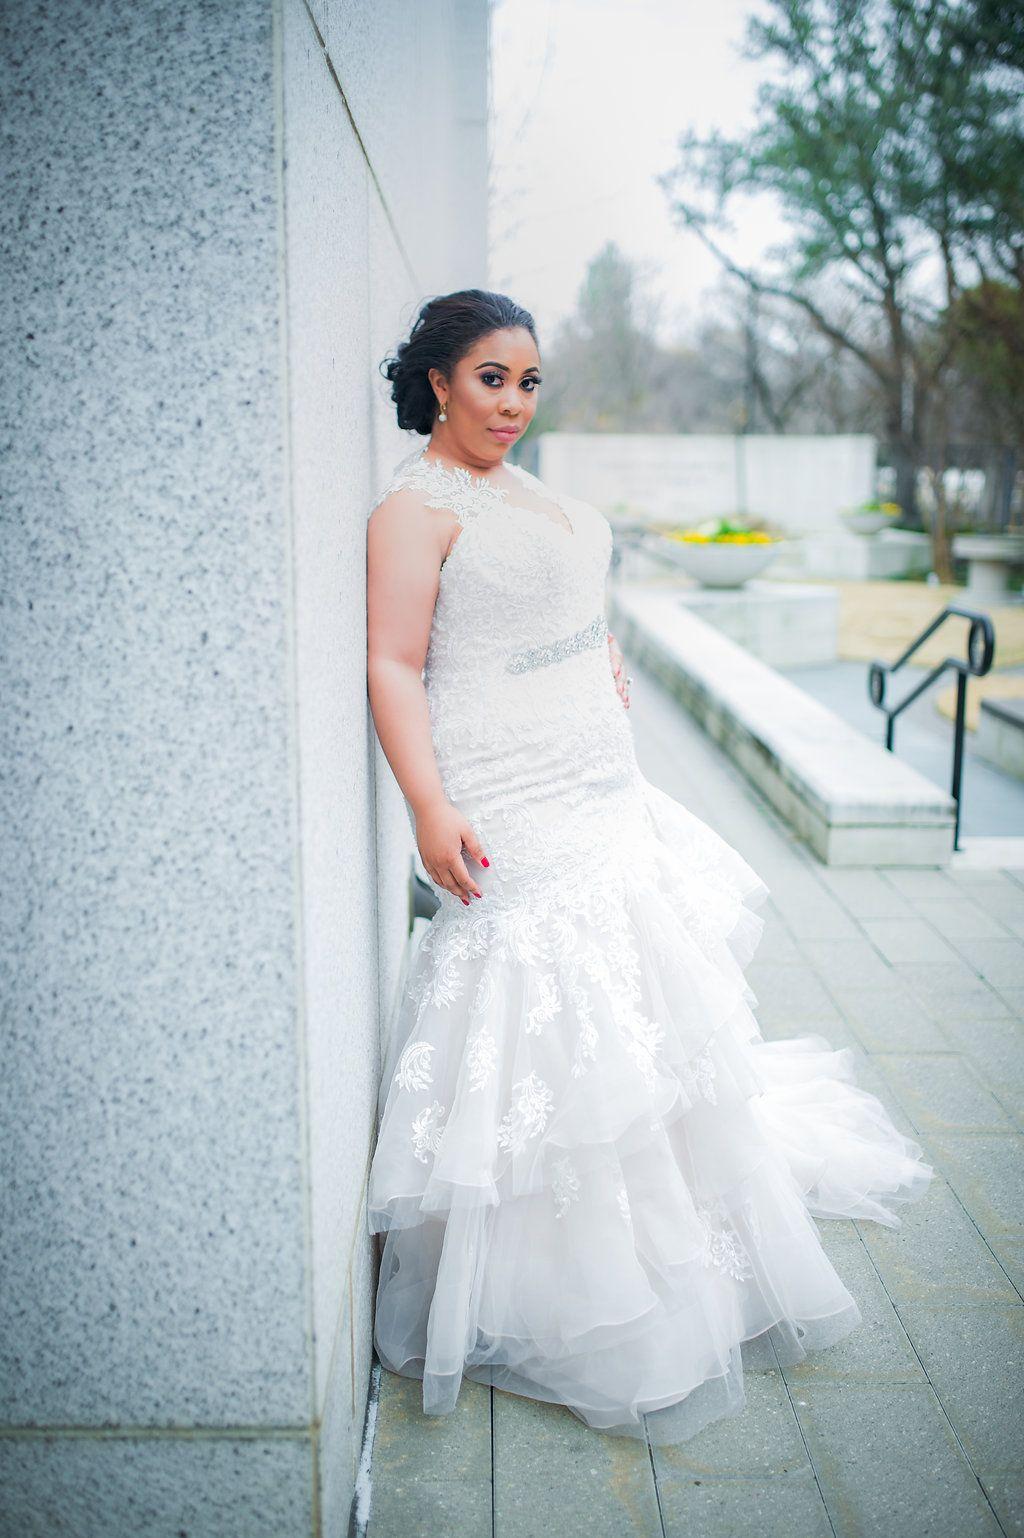 DALLAS WEDDING PHOTOGRAPHER | Lovers lane